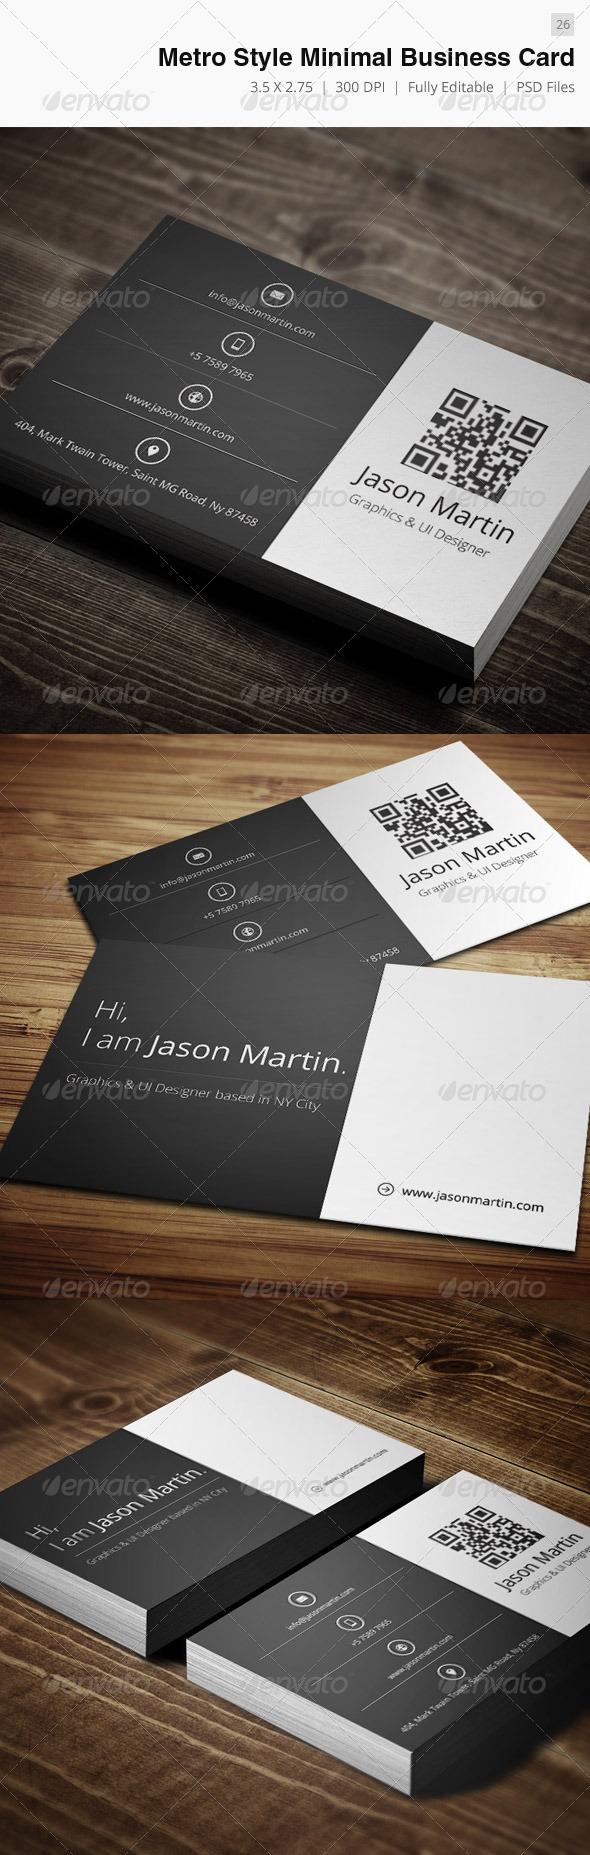 Minimal Creative Business Card - 26 - Creative Business Cards